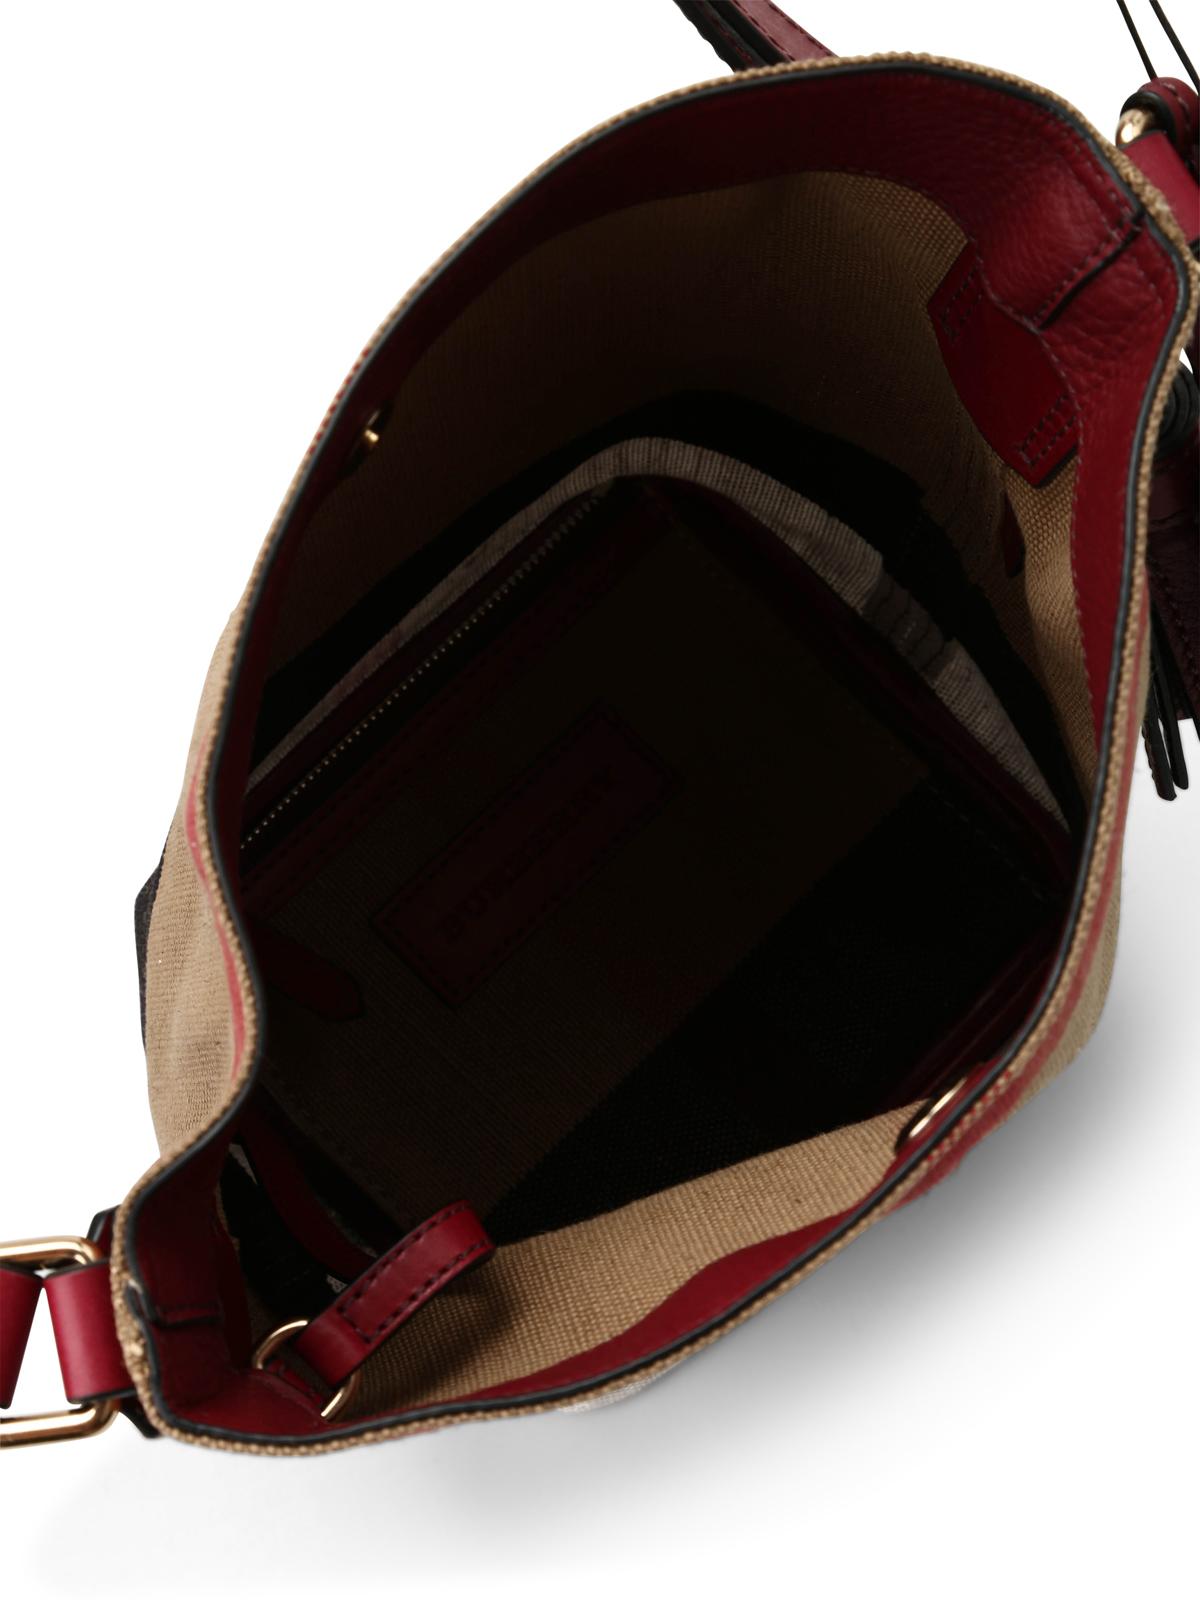 0c938fbd5b16 Burberry - Mini Ashby bucket bag - Bucket bags - 4020485 1